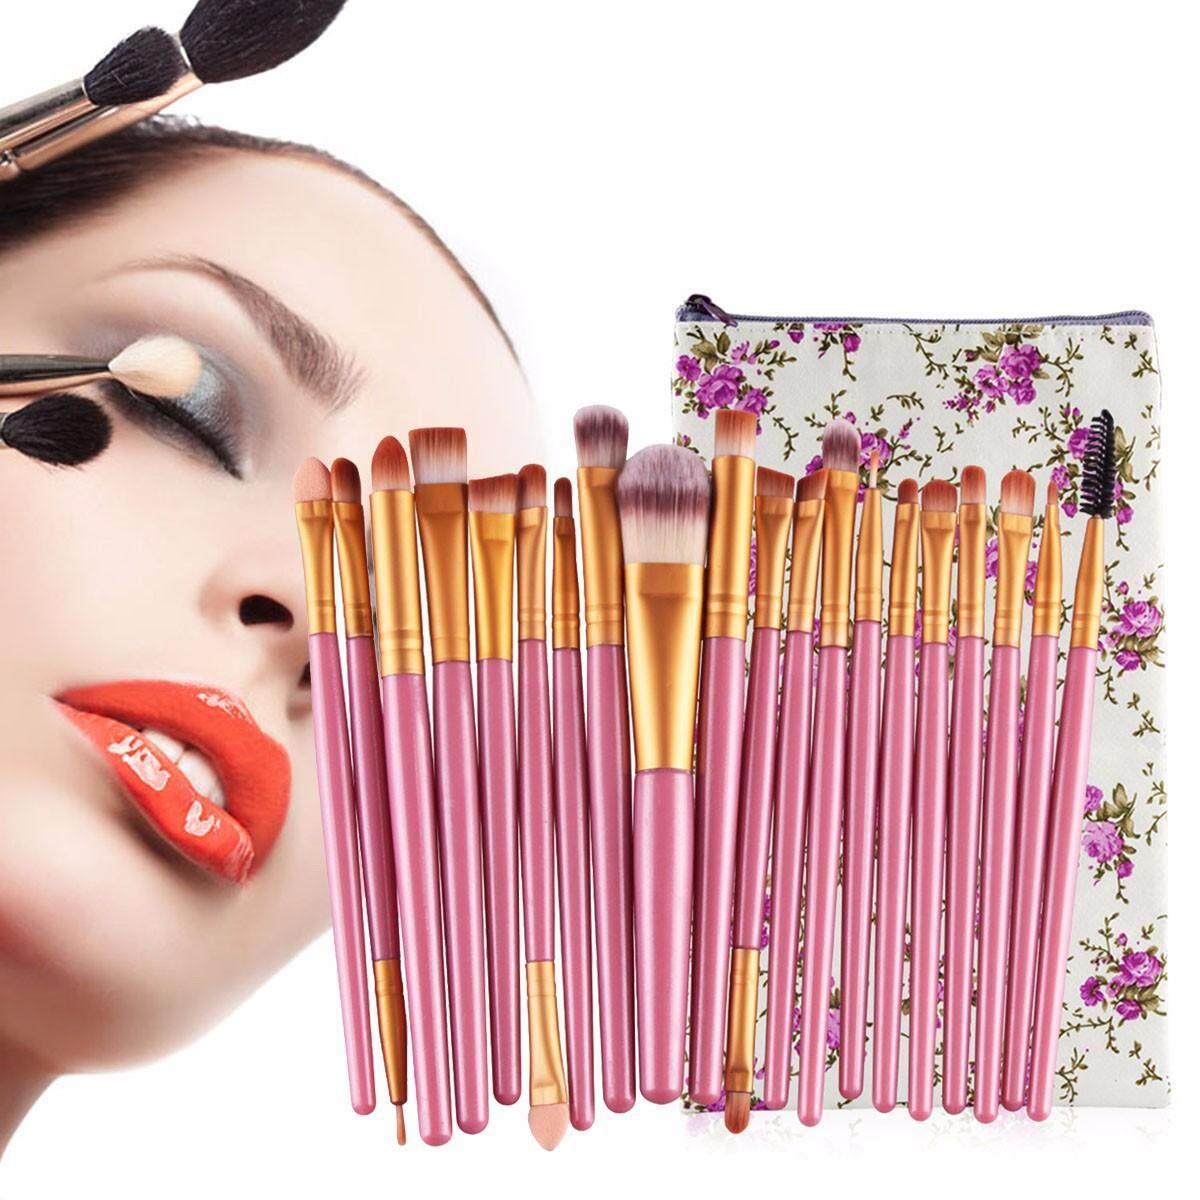 Maange 20 Buah Set Kuas untuk Make Up Profesional Pemulas Mata Foundation Alis Makeup Bibir Paket